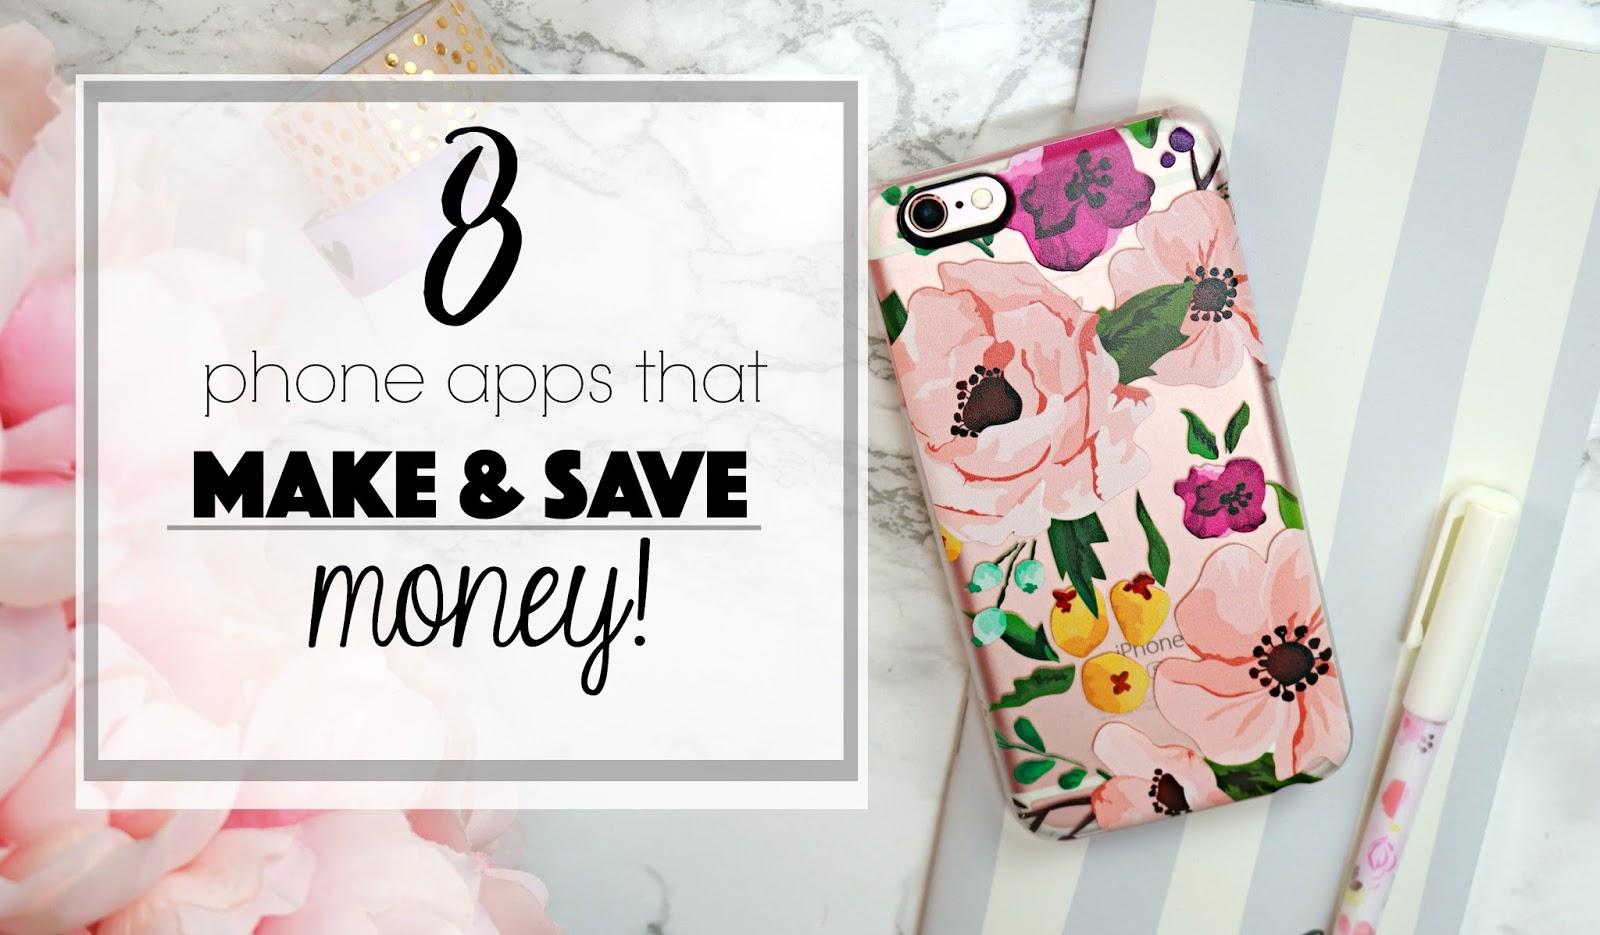 BelindaSelene: 8 PHONE APPS THAT MAKE & SAVE YOU MONEY!